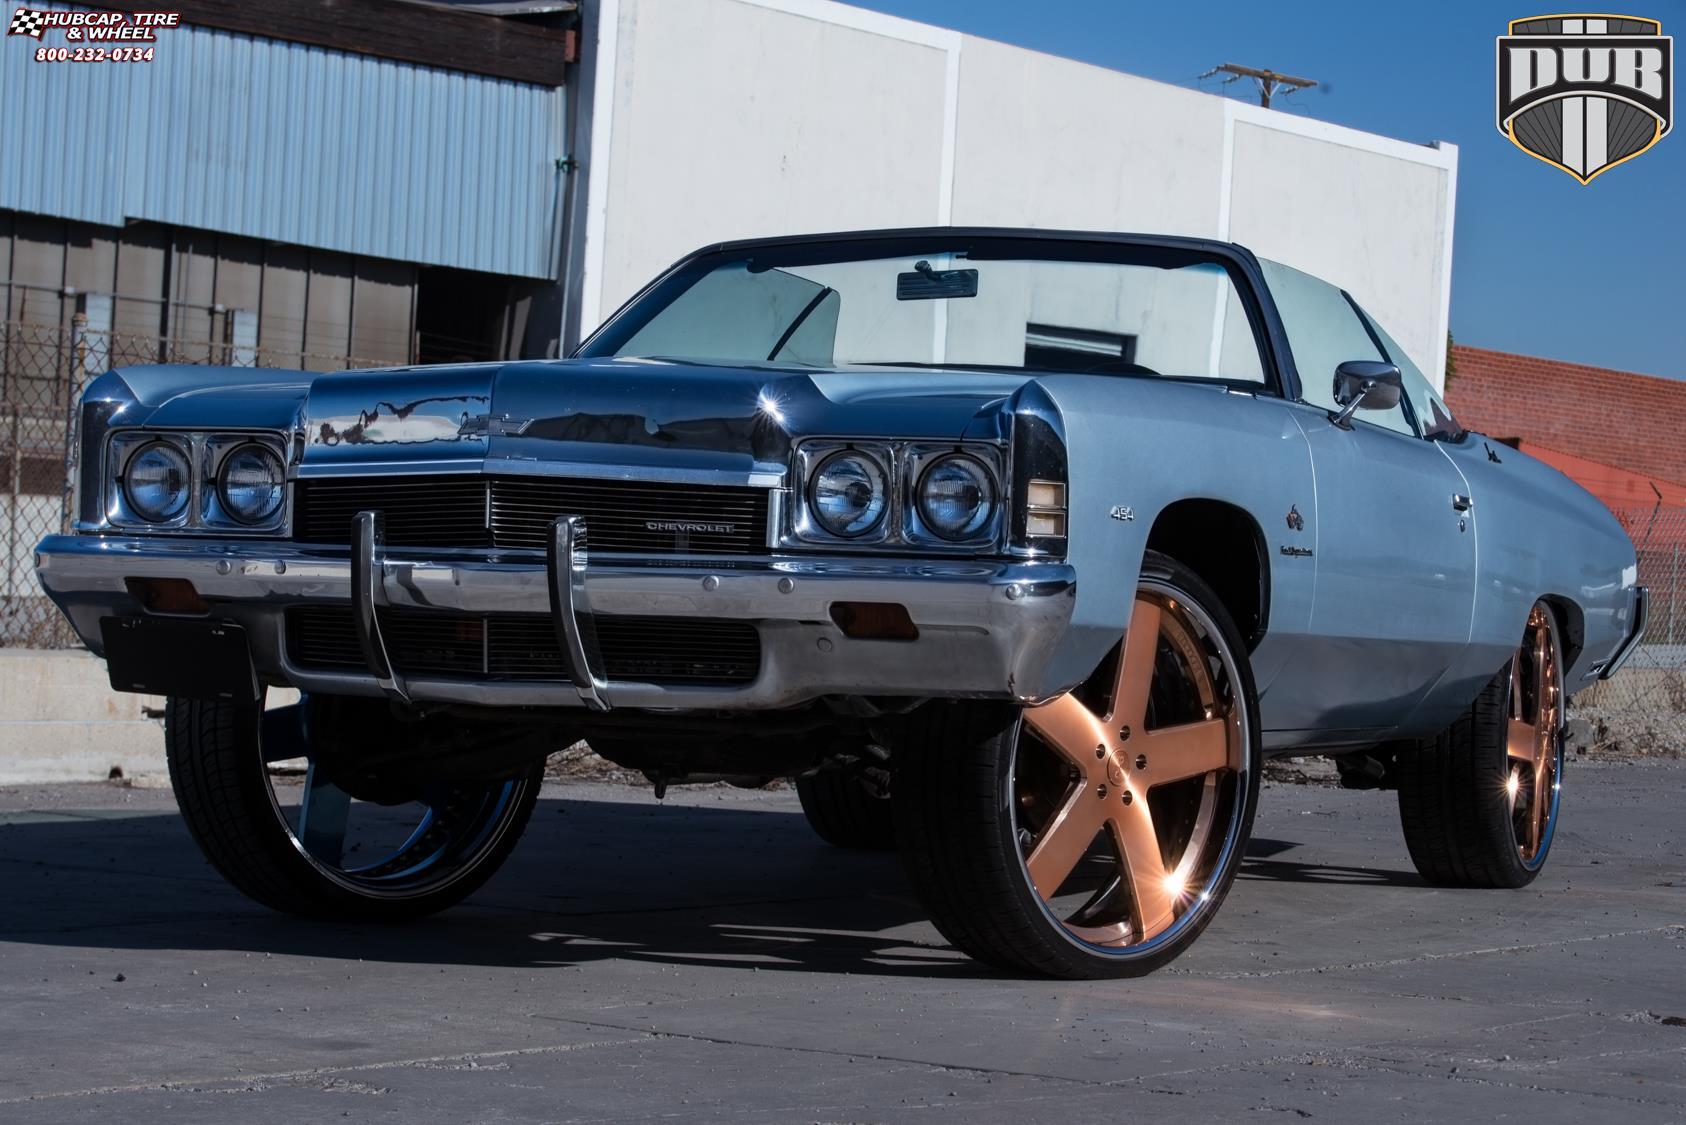 Chevrolet Impala Dub X84 Baller Wheels Brushed W Rose